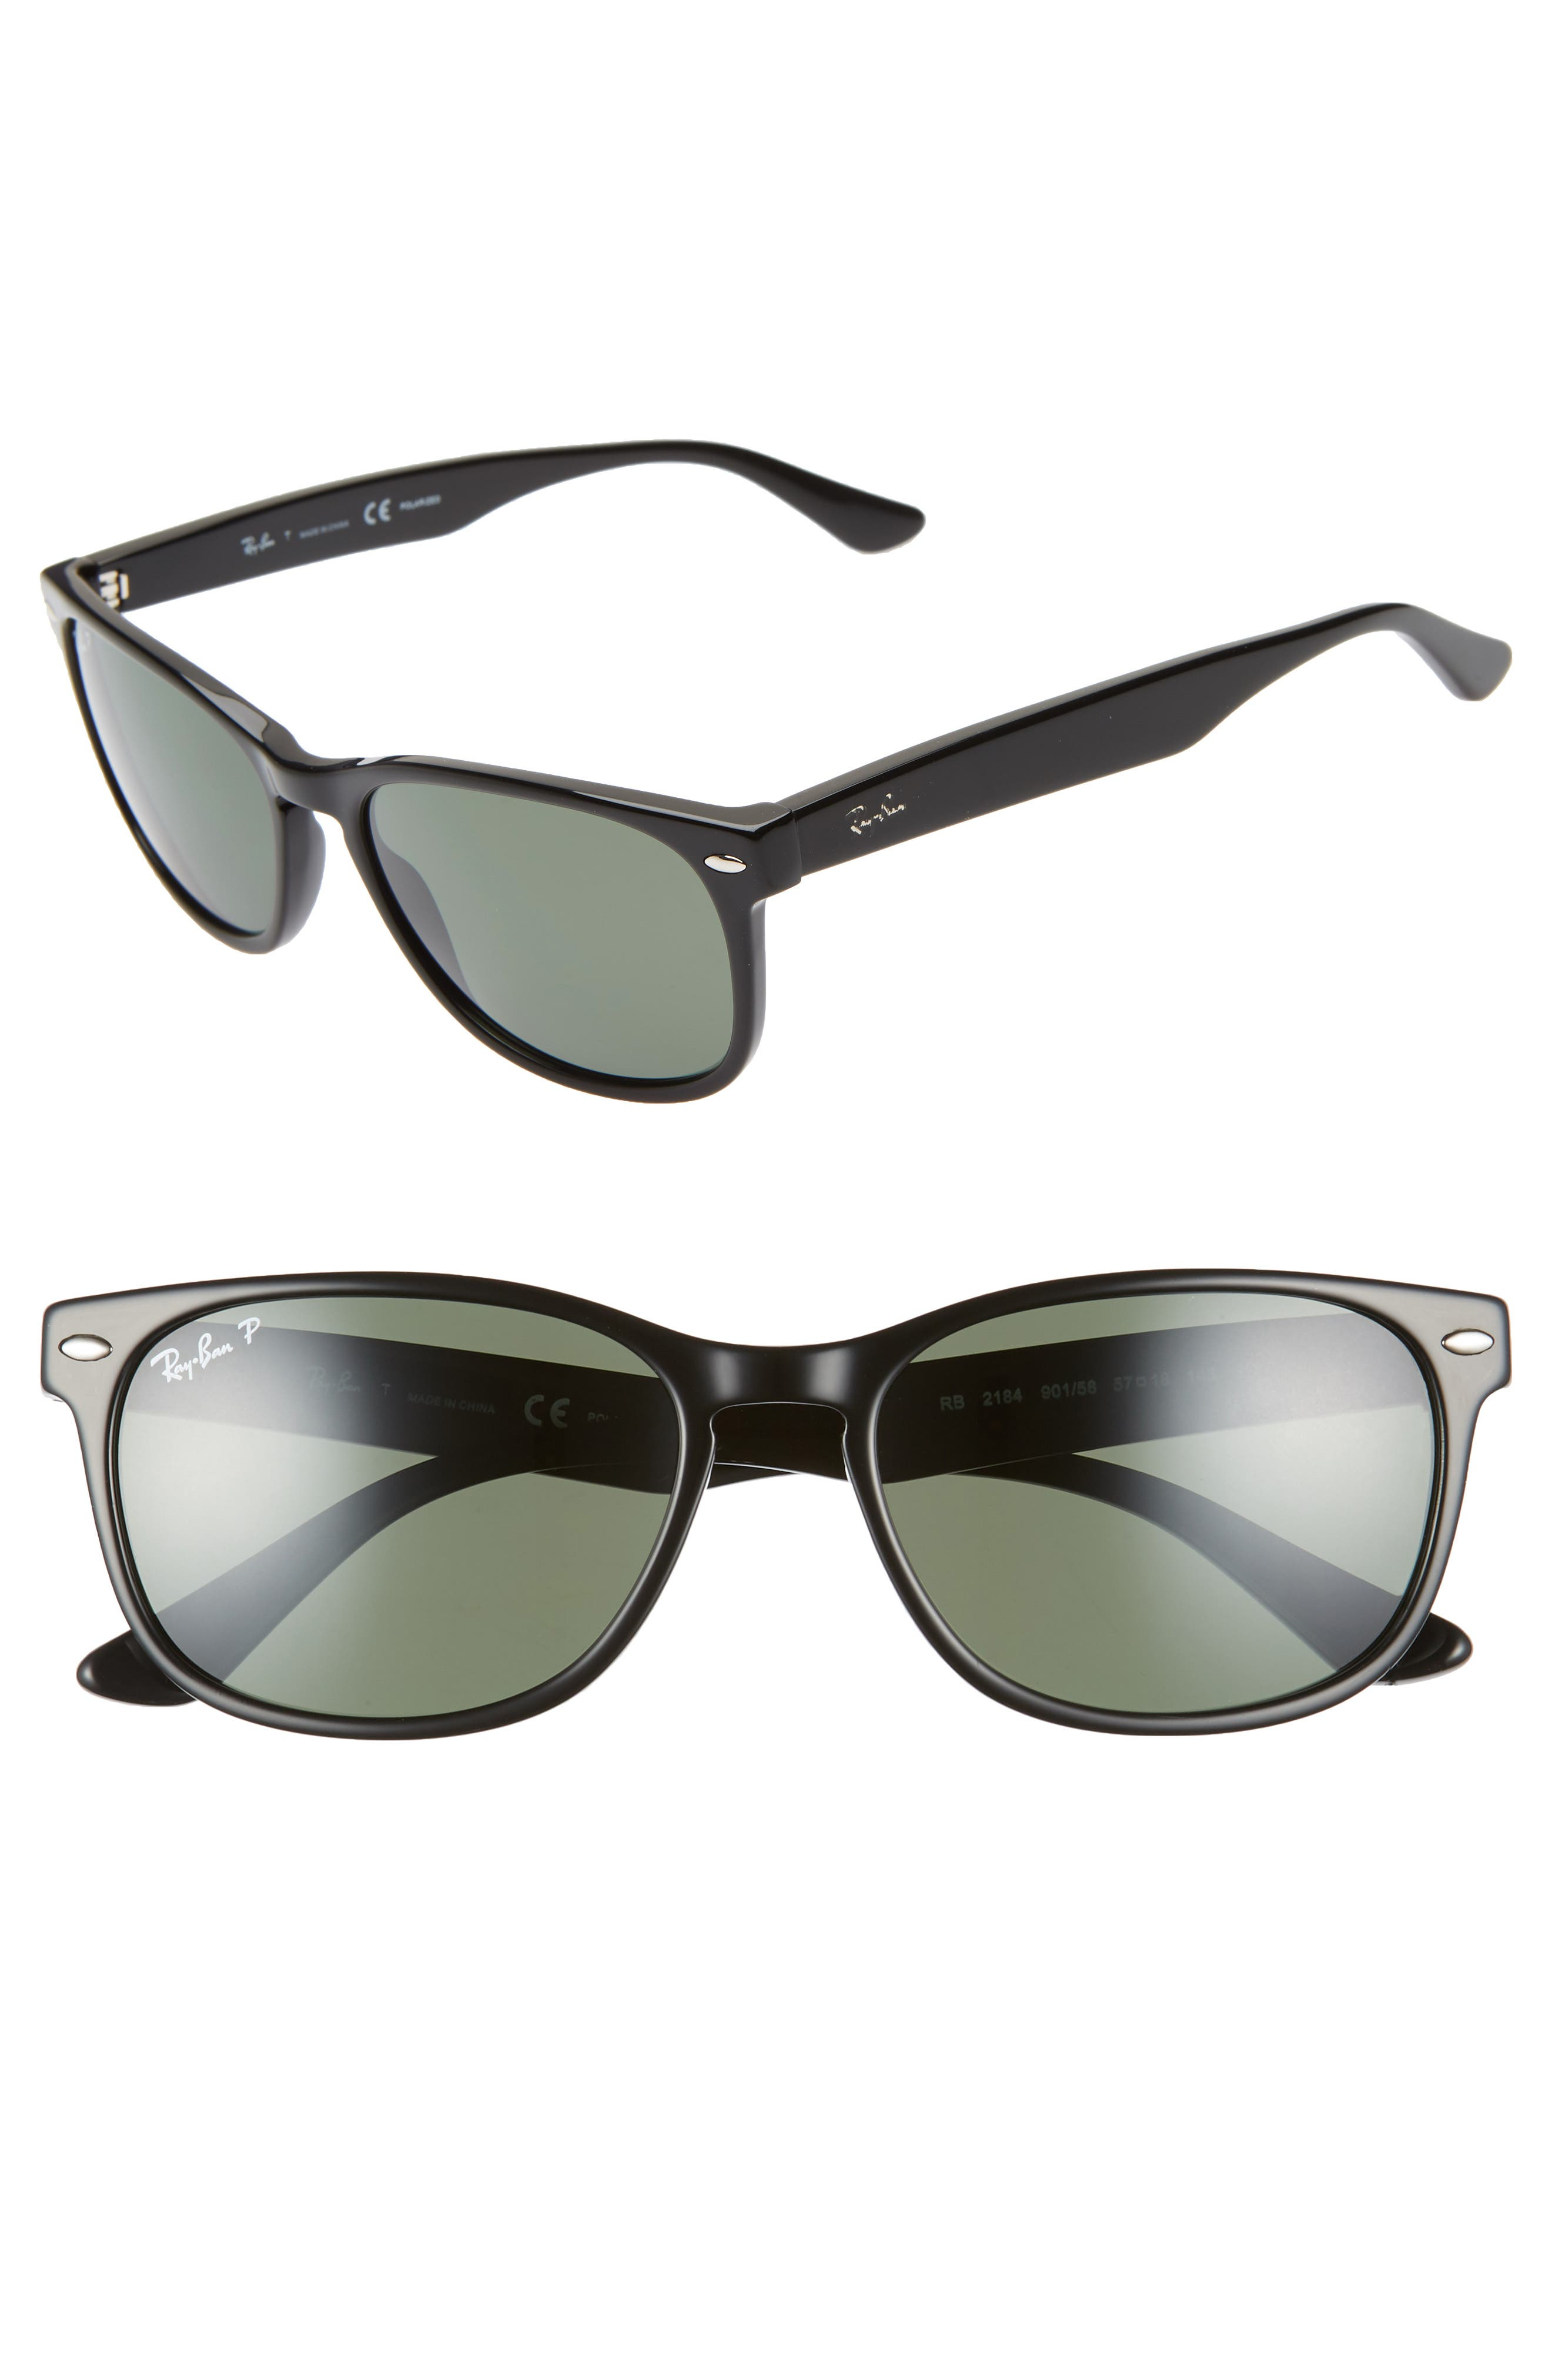 Ray-Ban Wayfarer 57Mm Polarized Sunglasses - Black